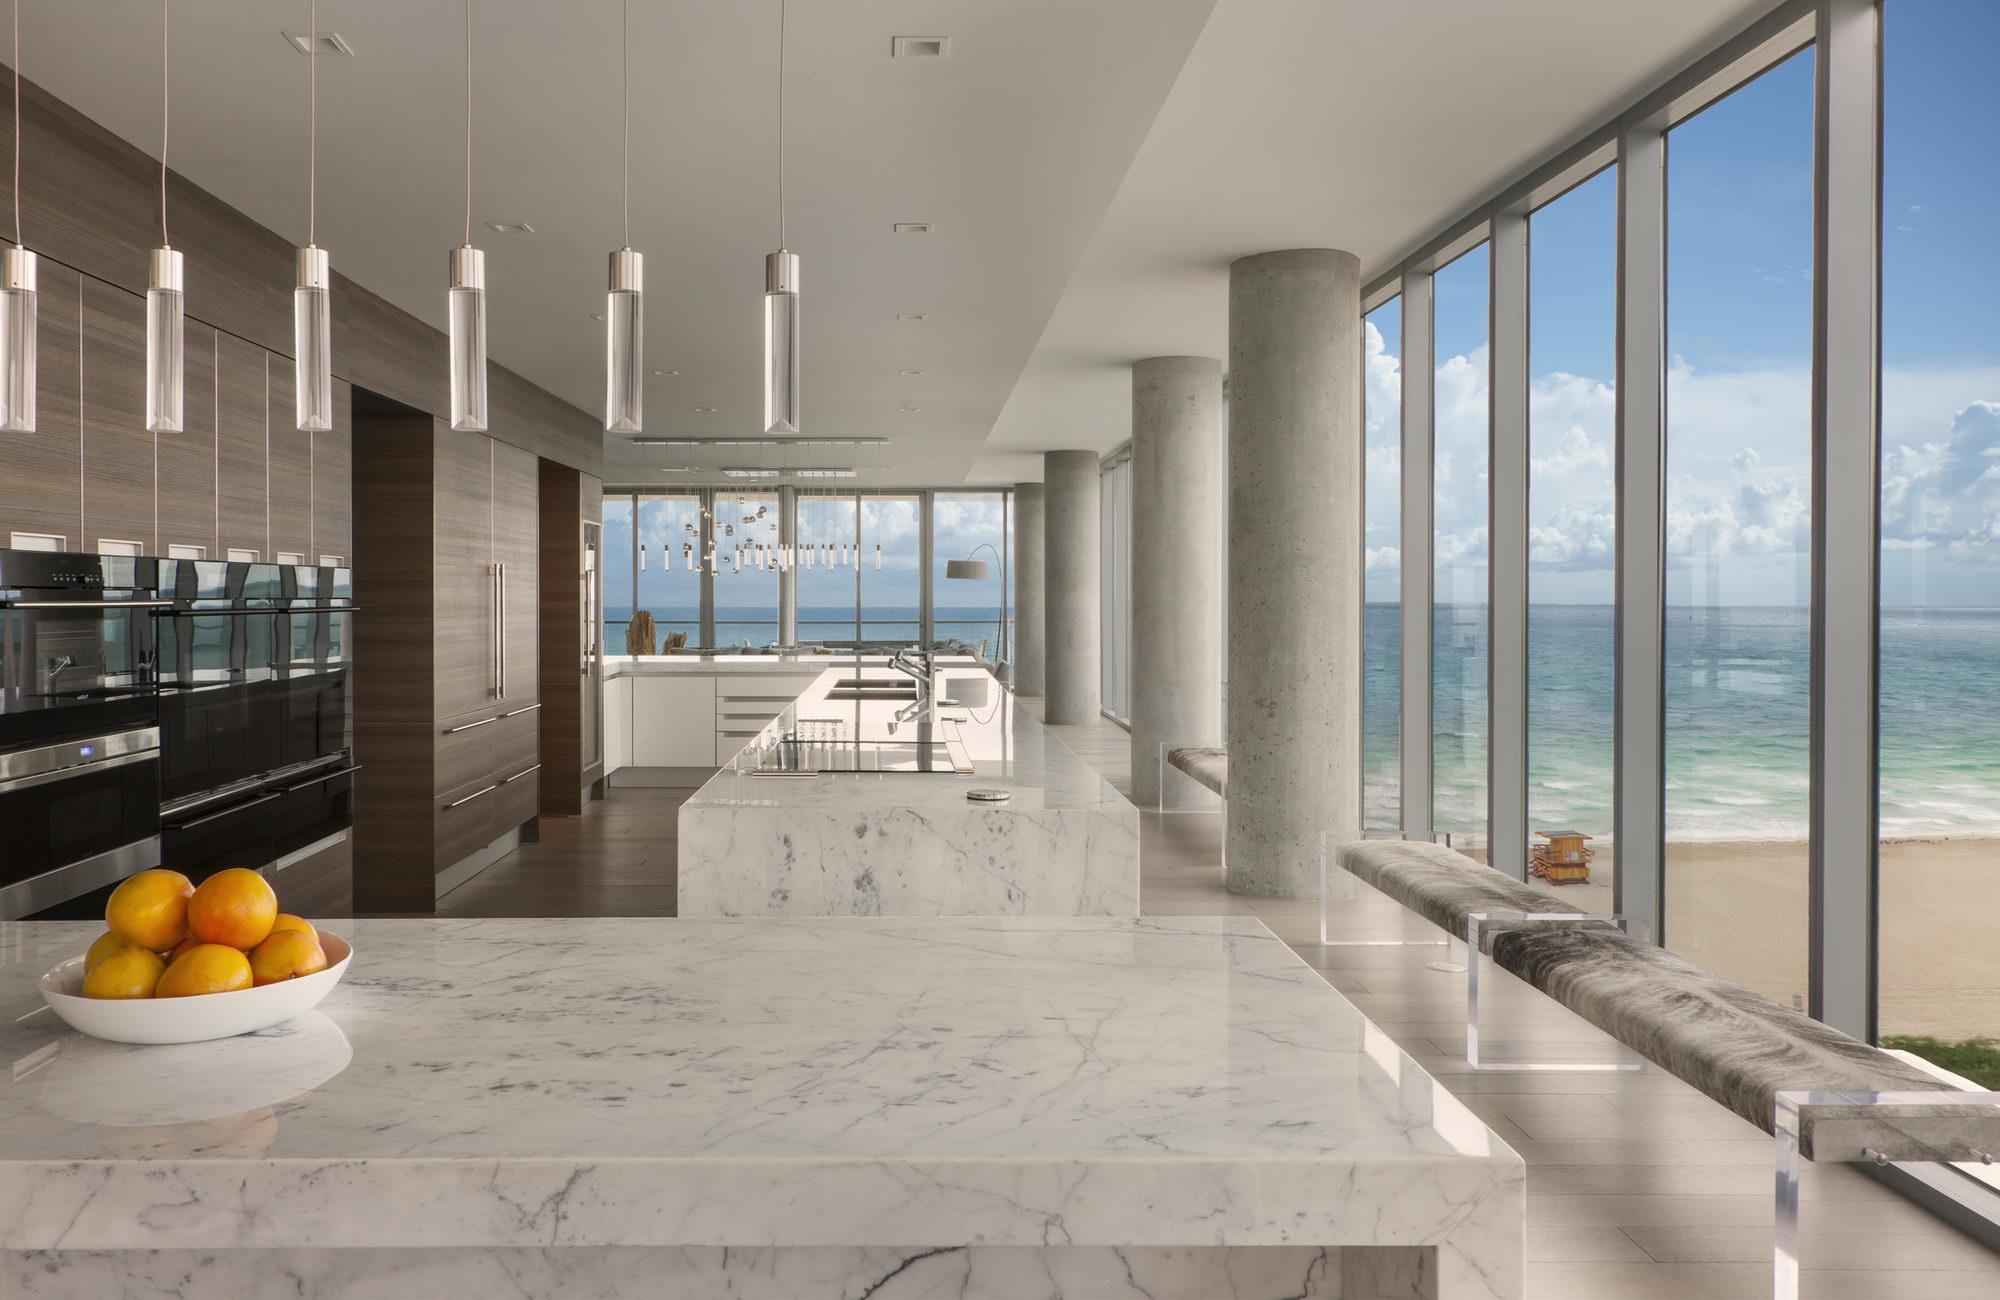 Ocean penthouse beach view south beach Miami Florida contemporary apartment kitchen